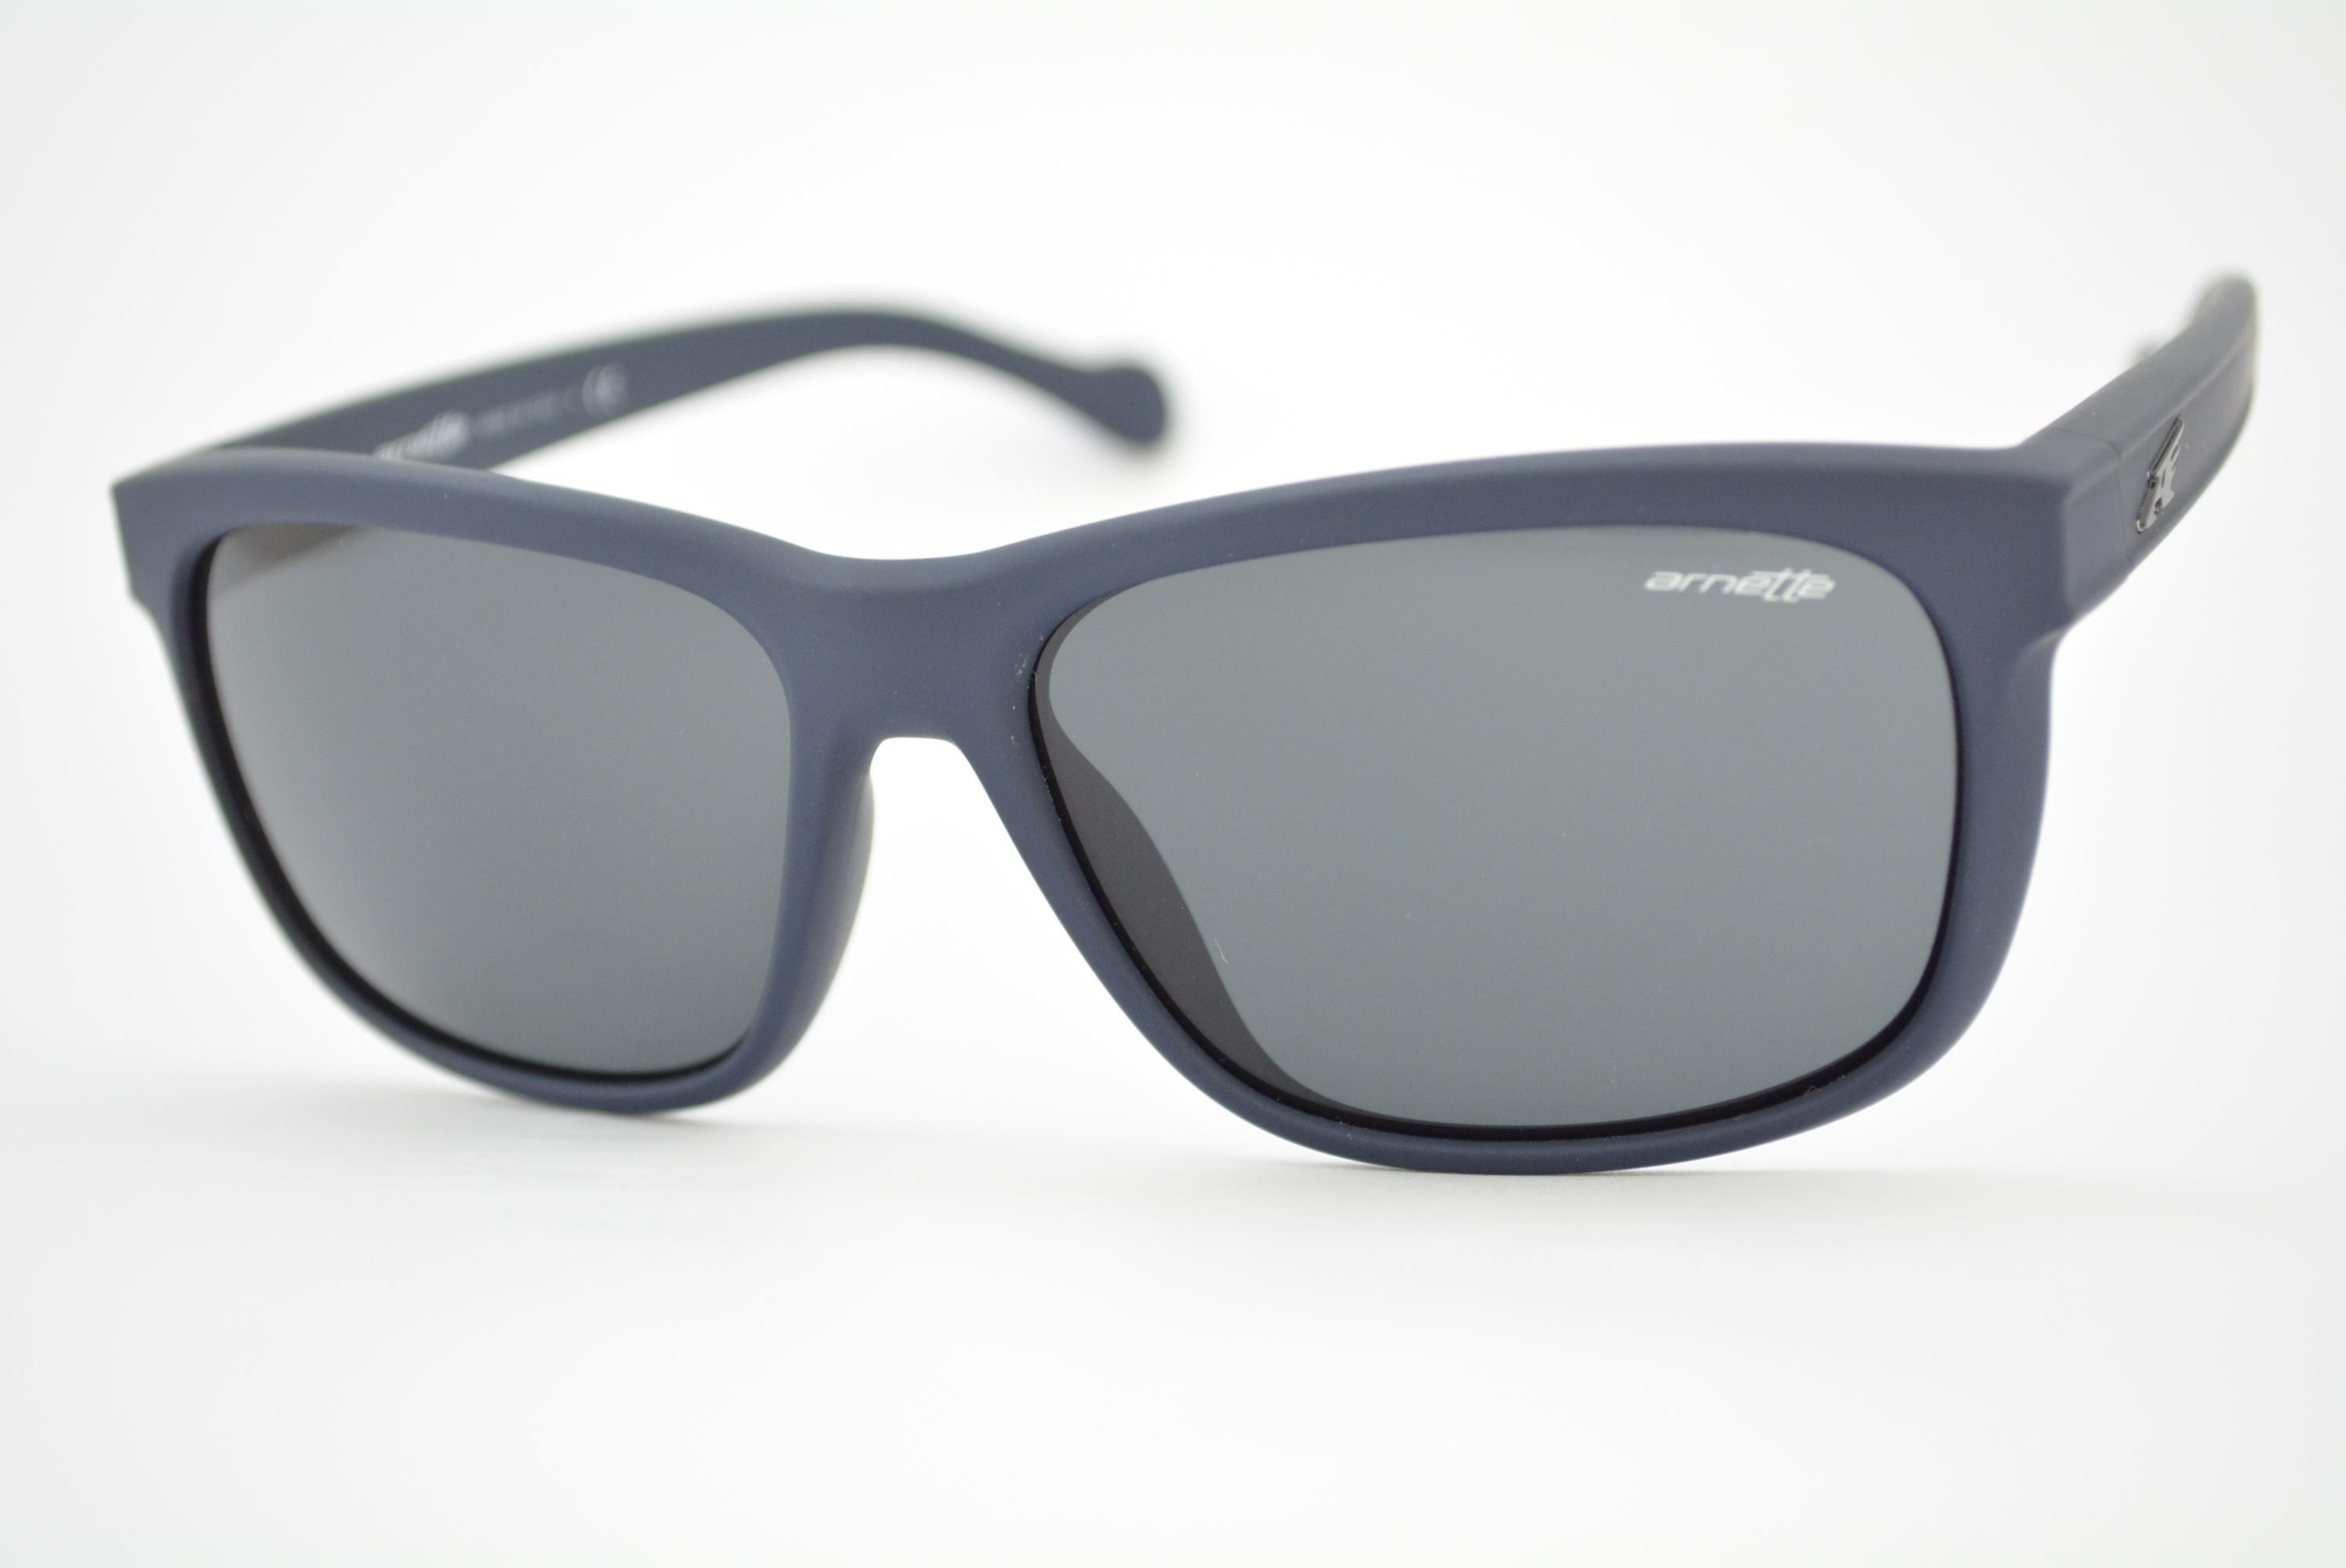 4abe0c3c6f792 óculos de sol Arnette mod Slacker 4196 2153 87 Ótica Cardoso